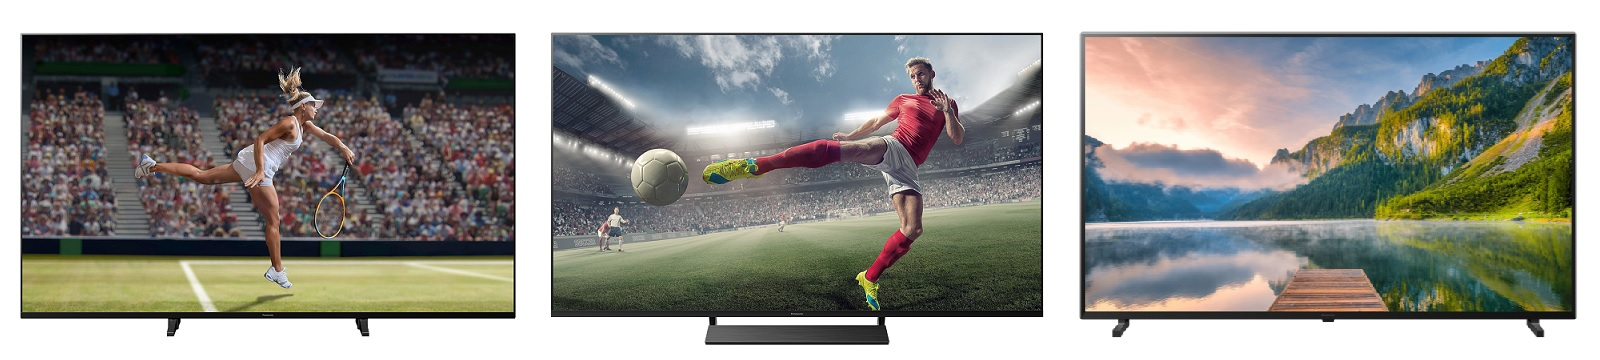 Panasonic 2021 LED LCD TV